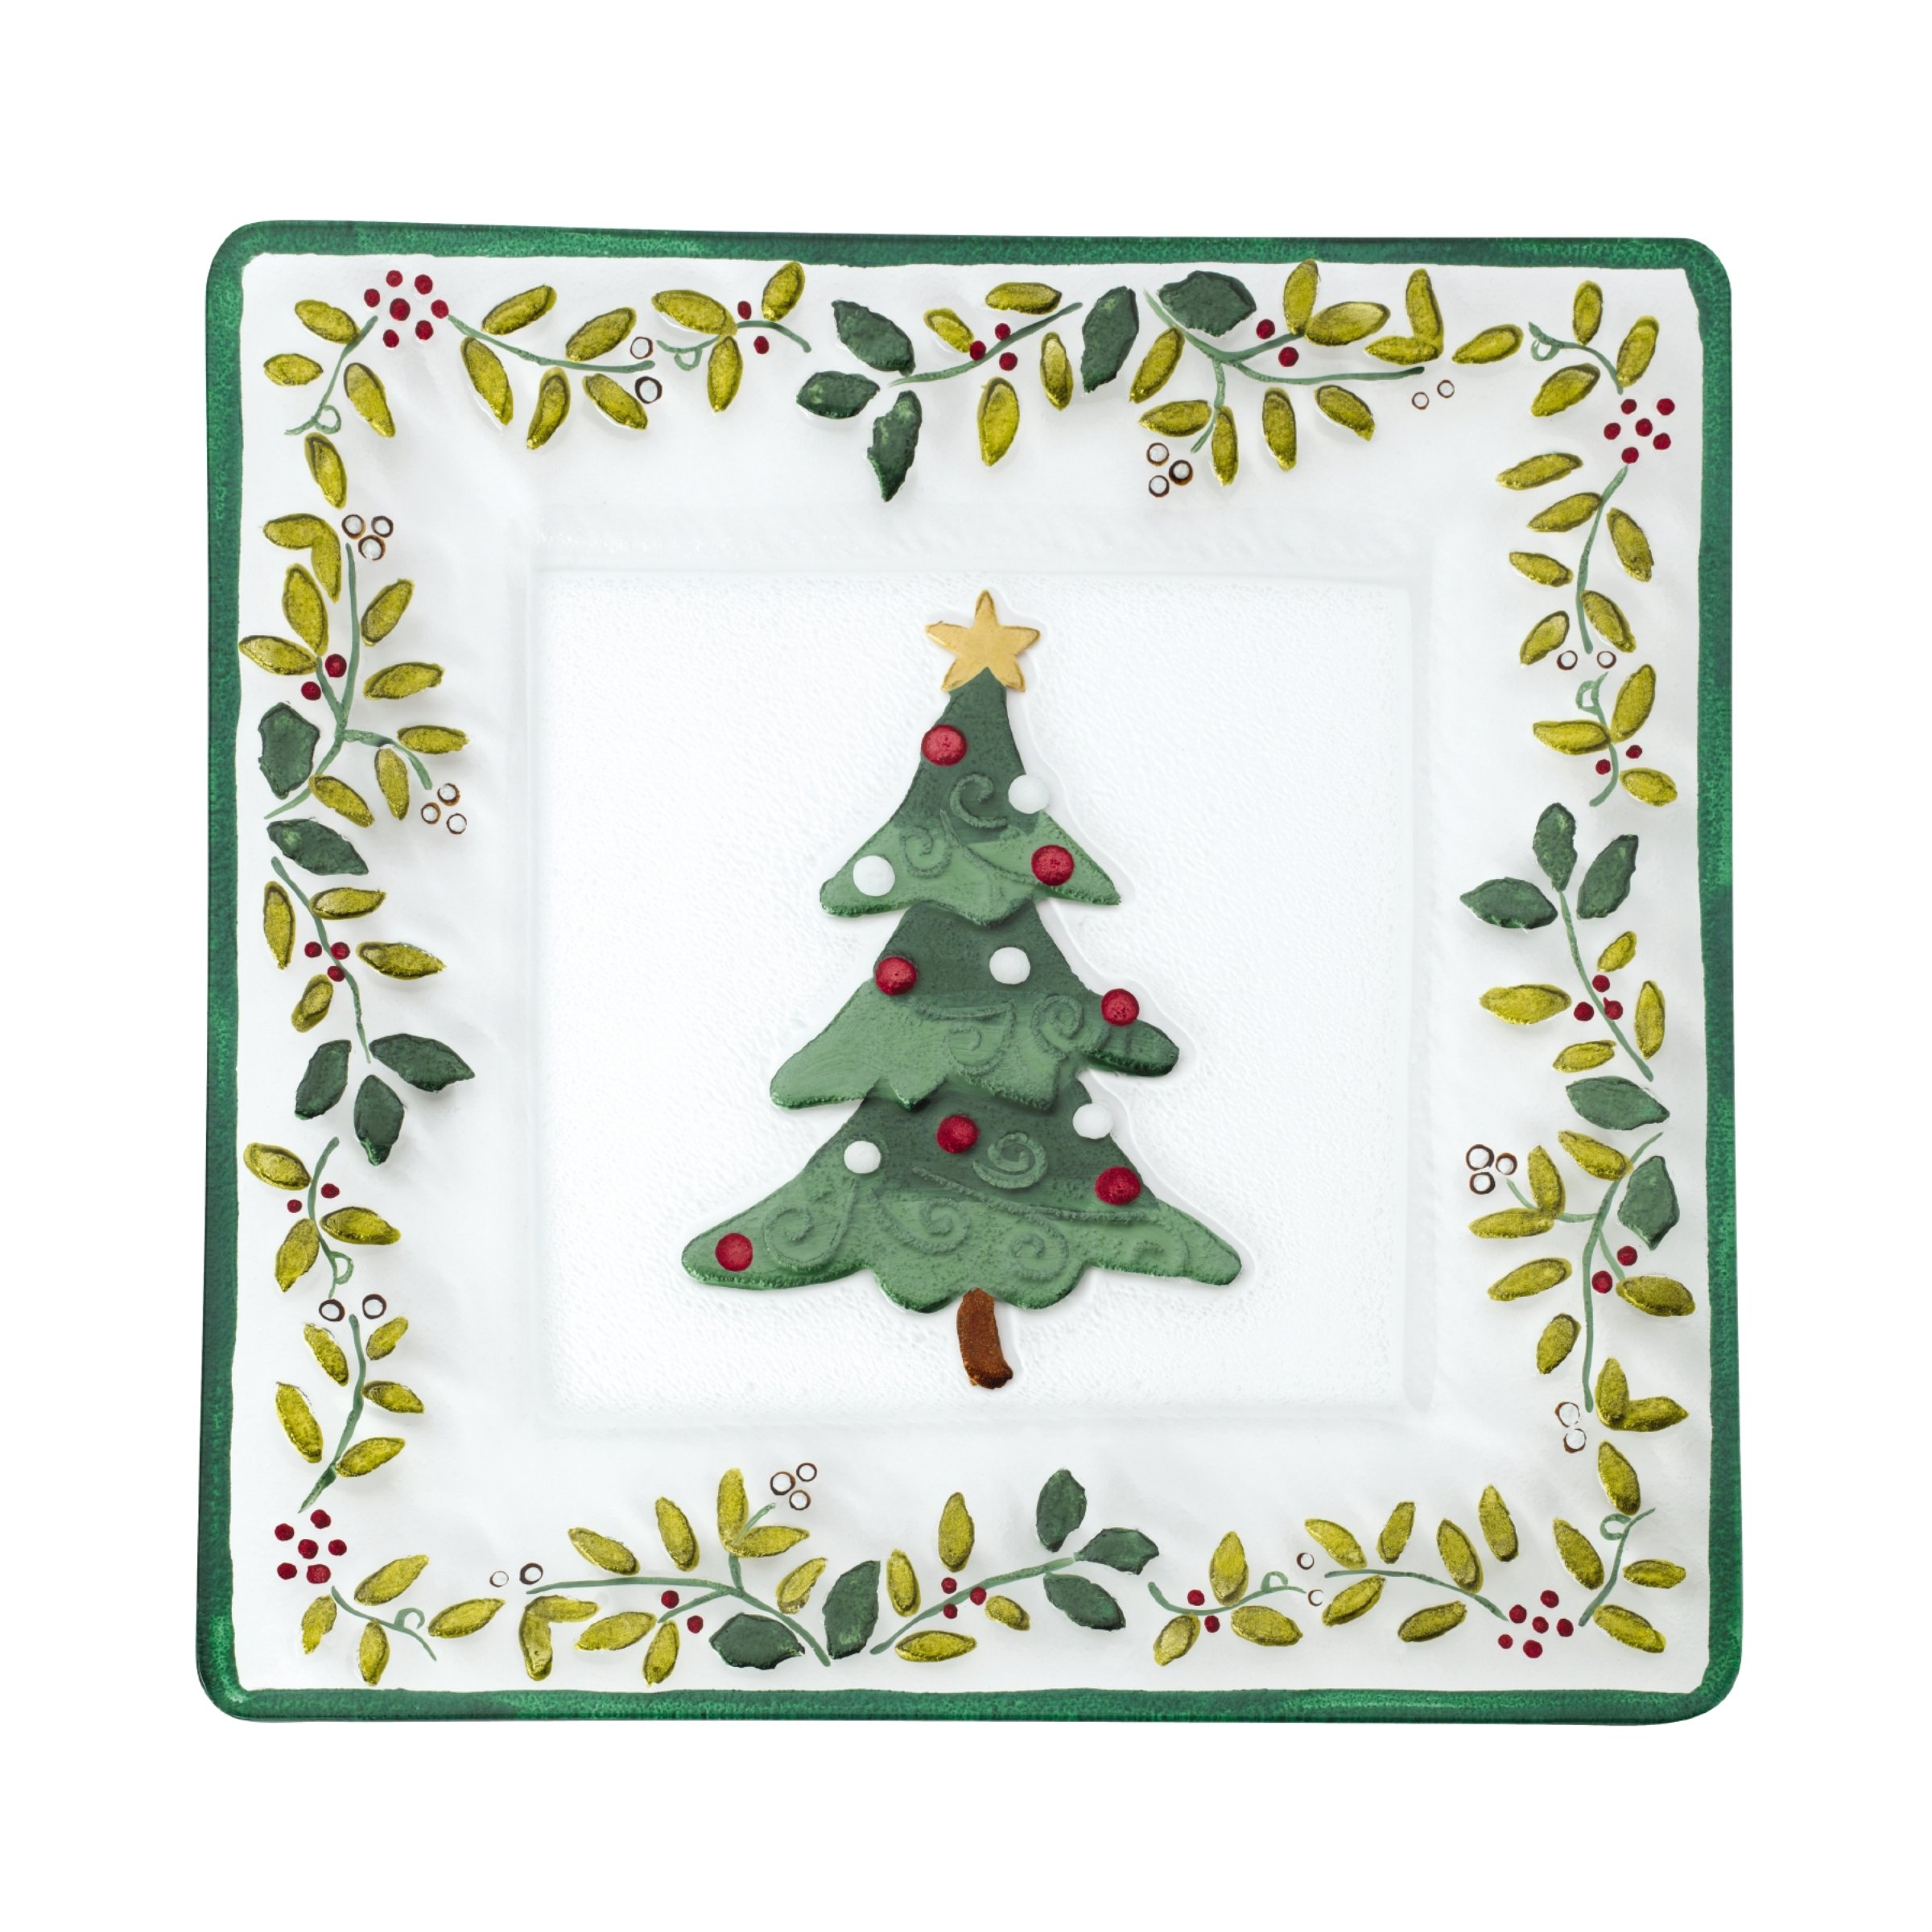 Pfaltzgraff Winterberry Handpainted Square Glass Christmas Tree Platter